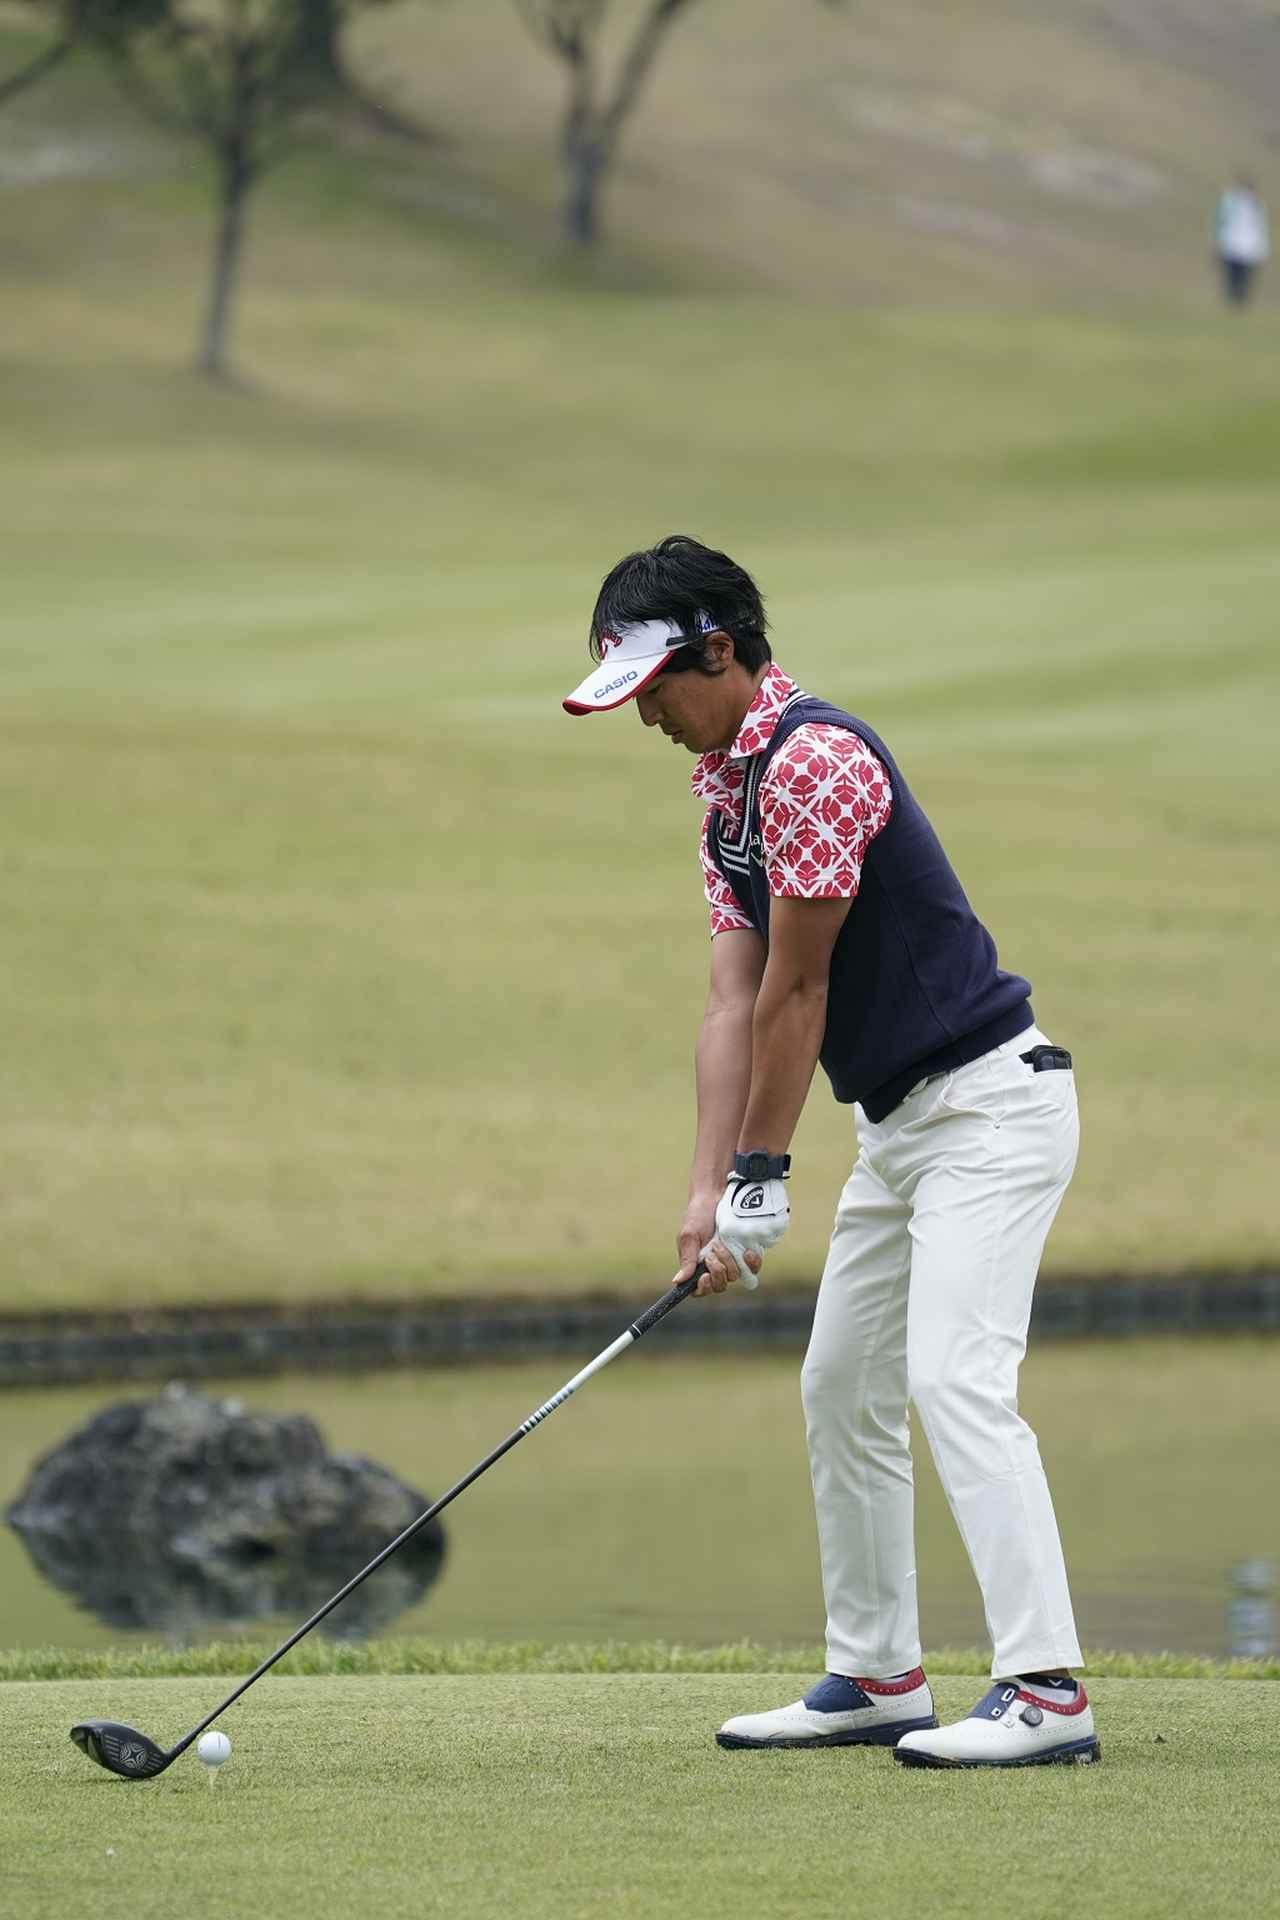 Images : 1番目の画像 - 石川遼ドライバー前方連続写真 - みんなのゴルフダイジェスト